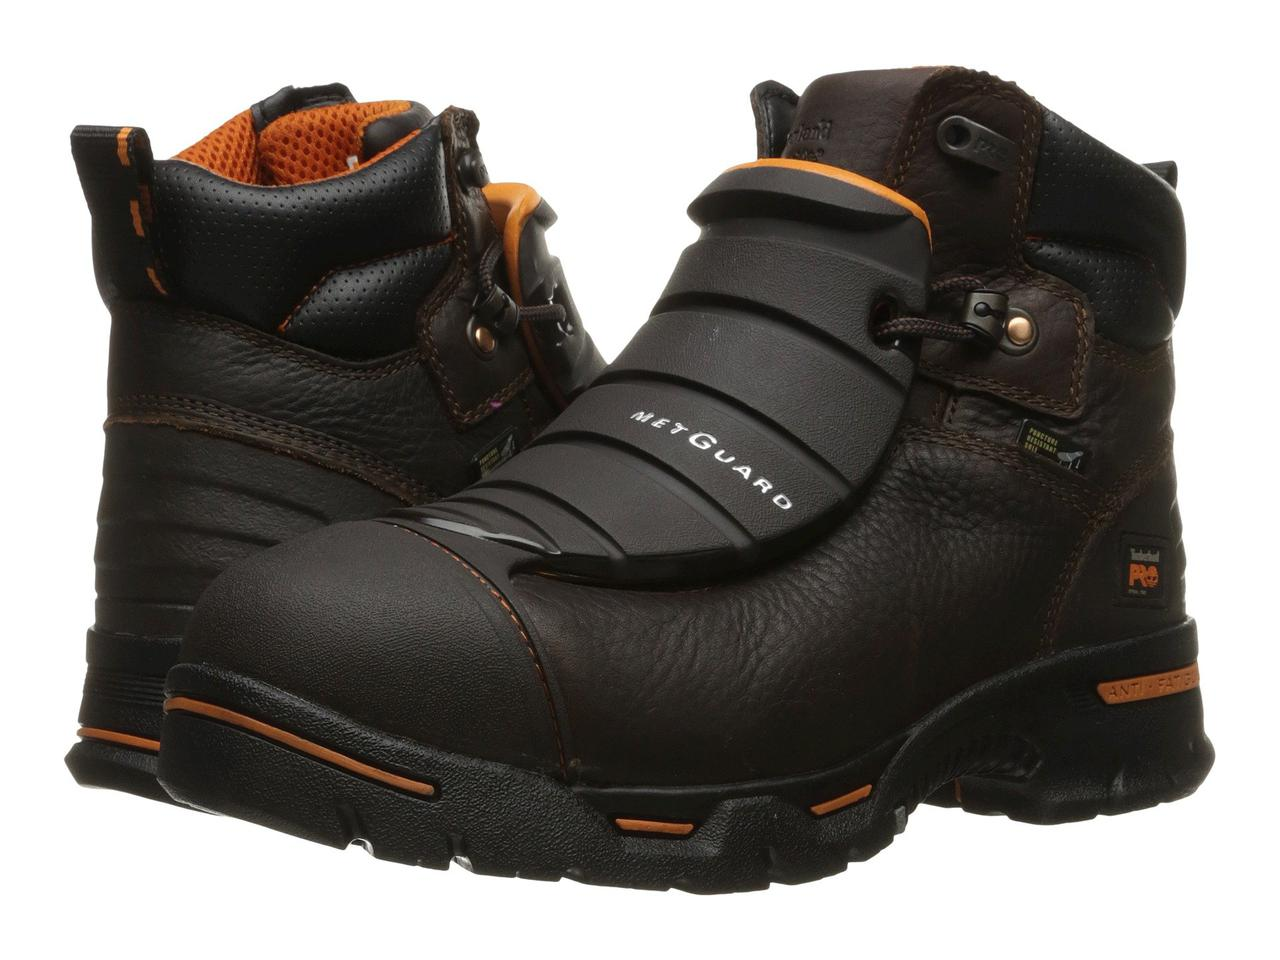 "Ботинки/Сапоги (Оригинал) Timberland PRO Endurance 6"" External Met Guard Steel Toe Brown Full Grain Leather"